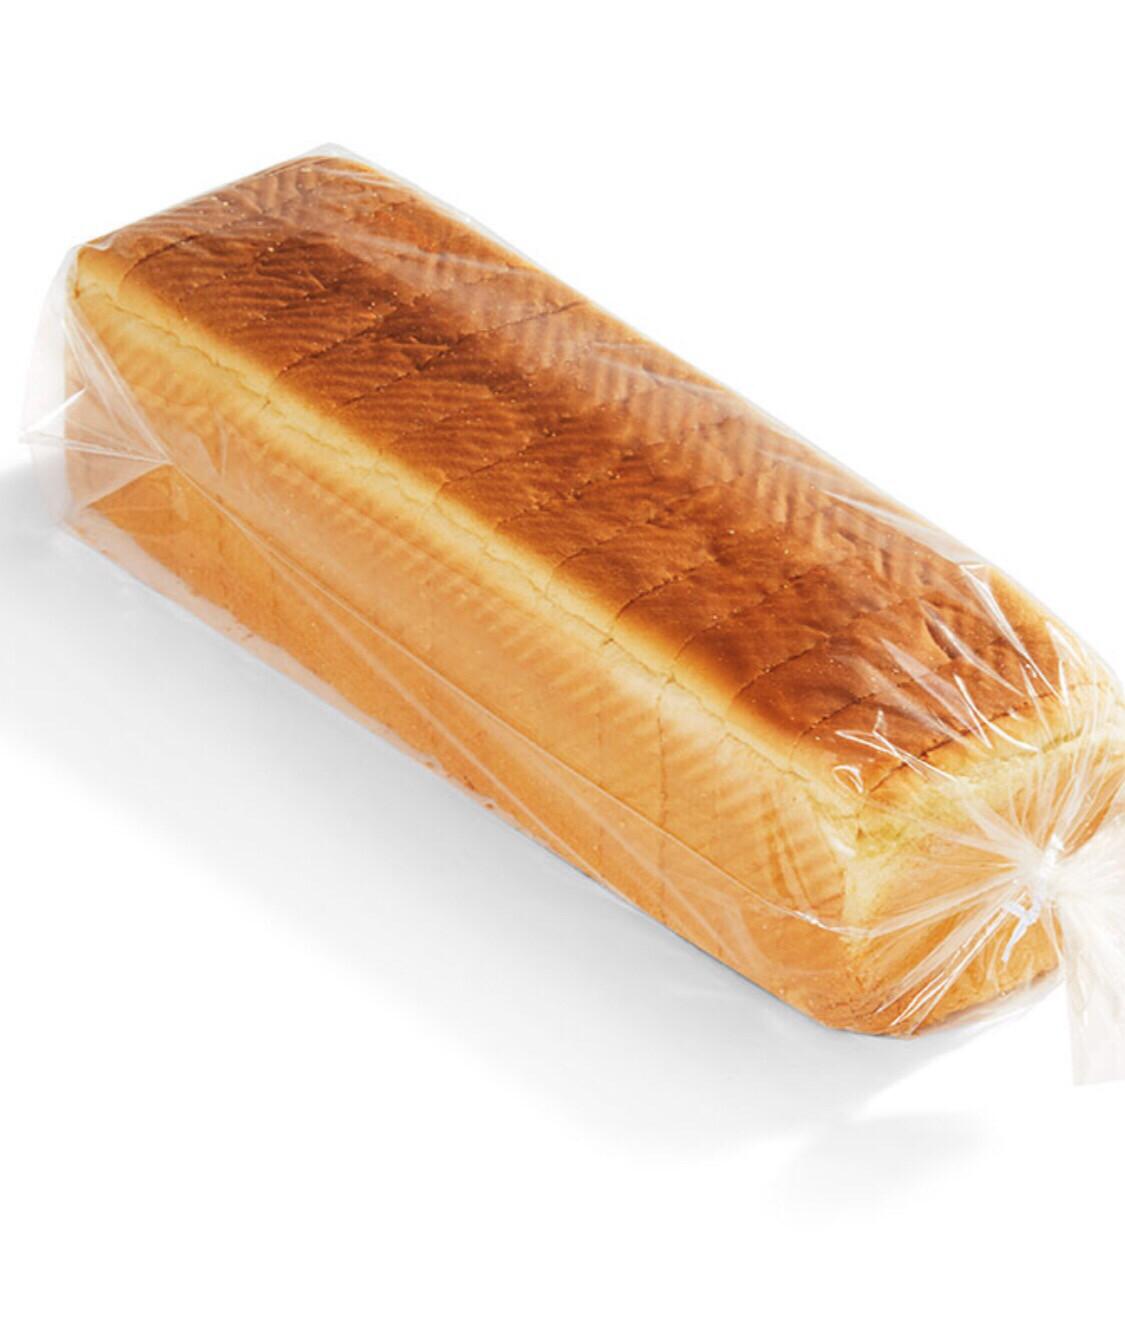 Fresh Texas Toast